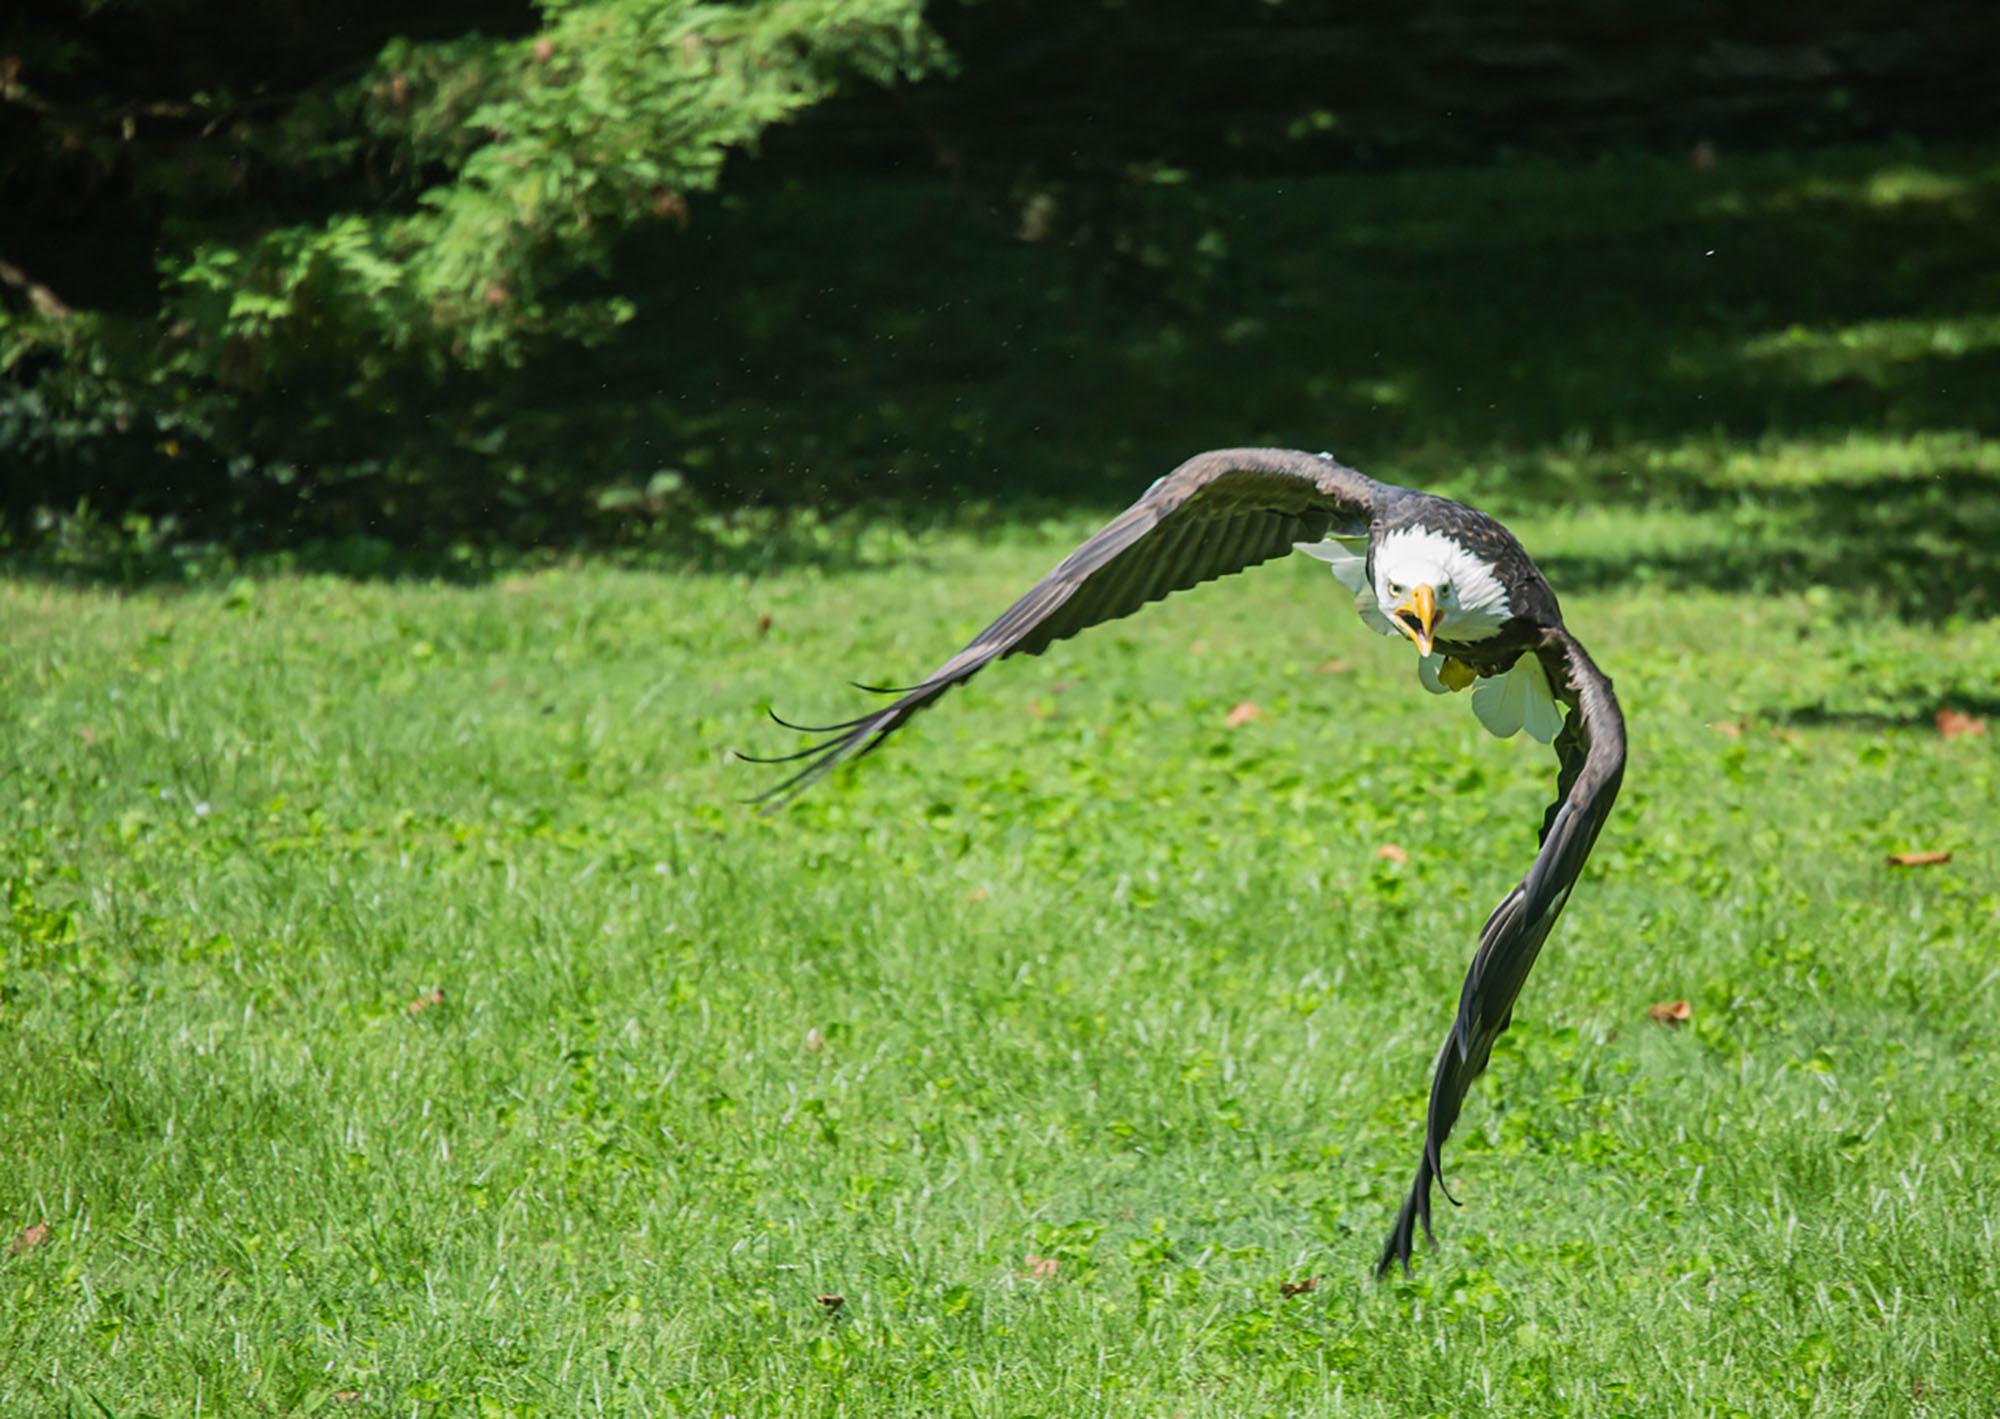 Chris Schmucki's Bald Eagle Shot